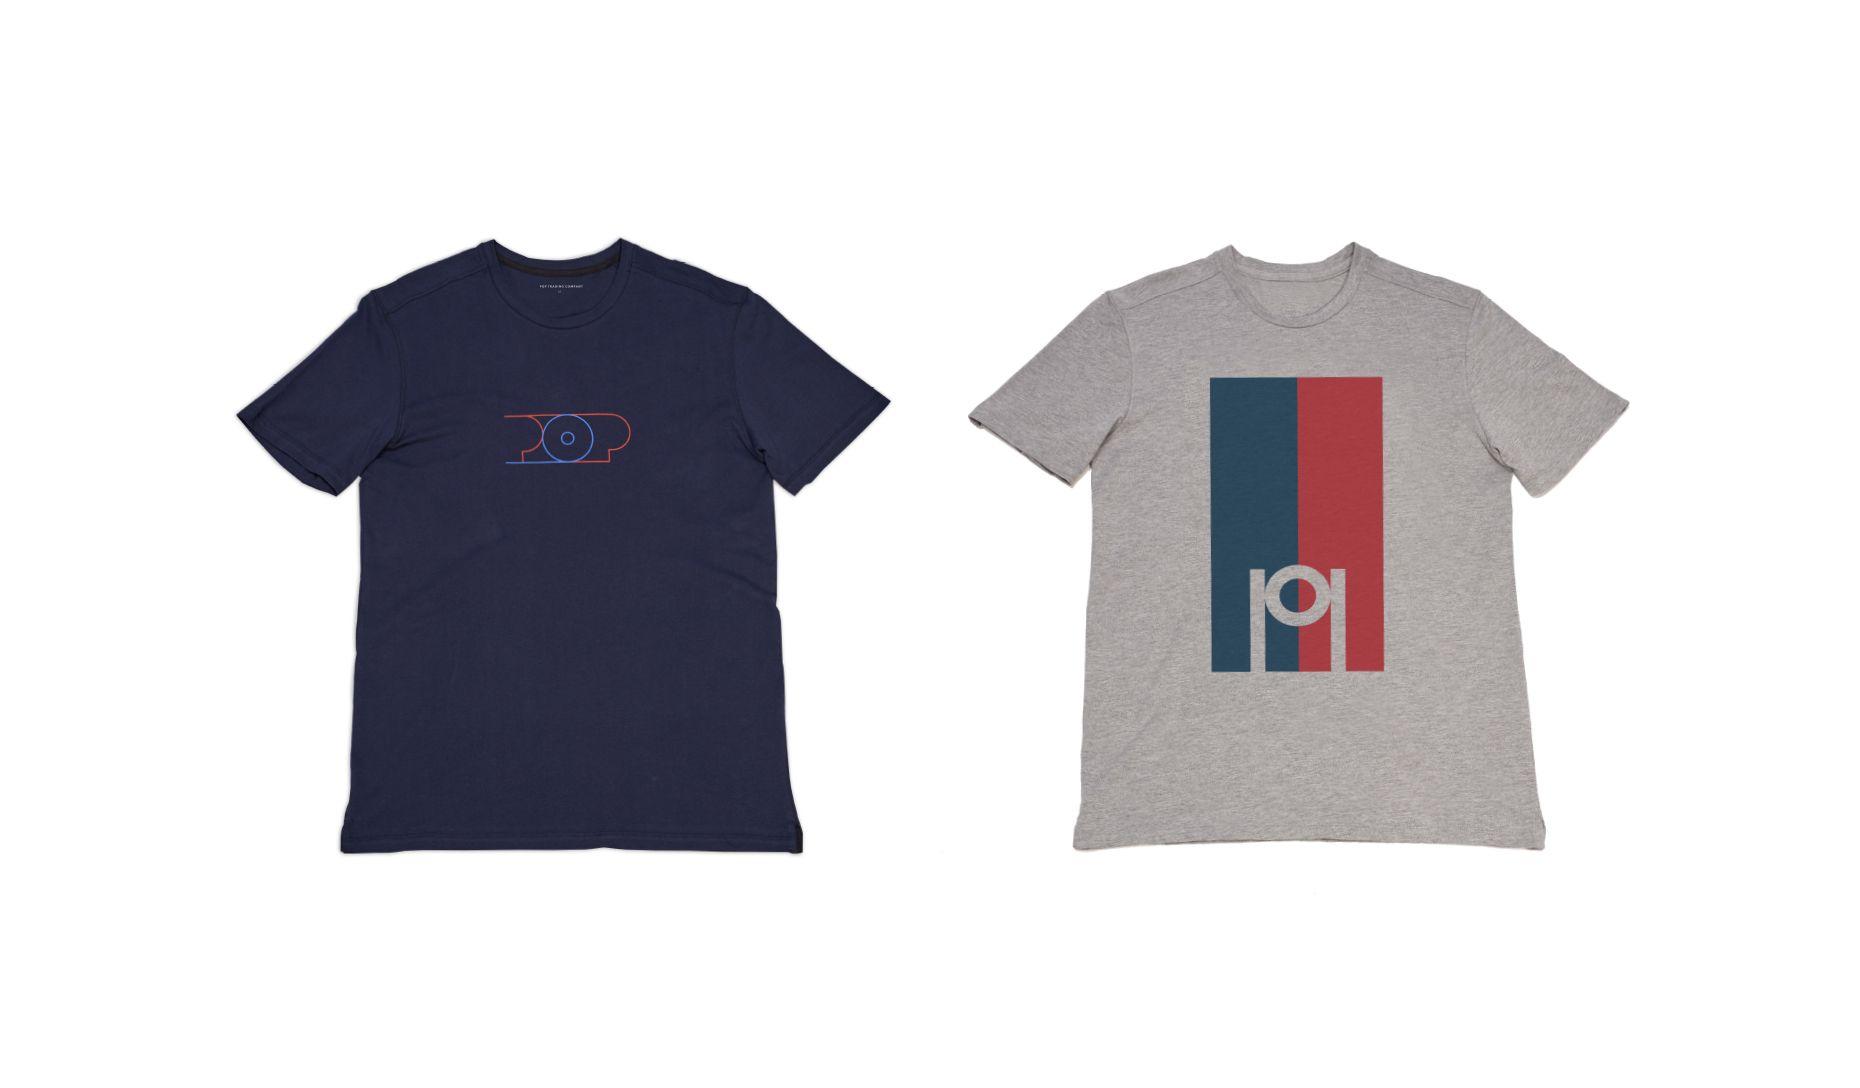 pop-trading-company-ss17-natas-t-shirt-lines-t-shirt